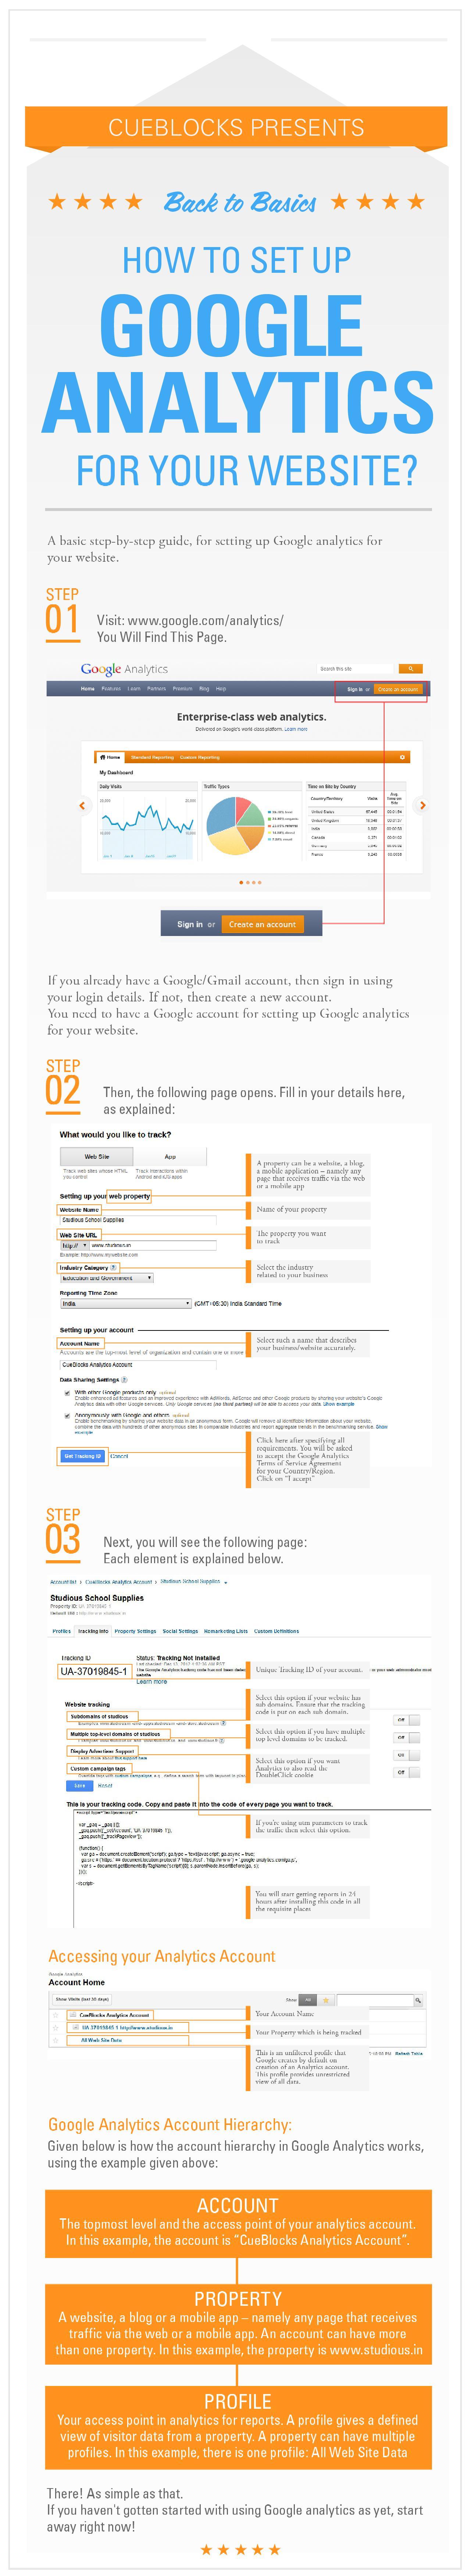 How to Set Up Google Analytics - Infographic